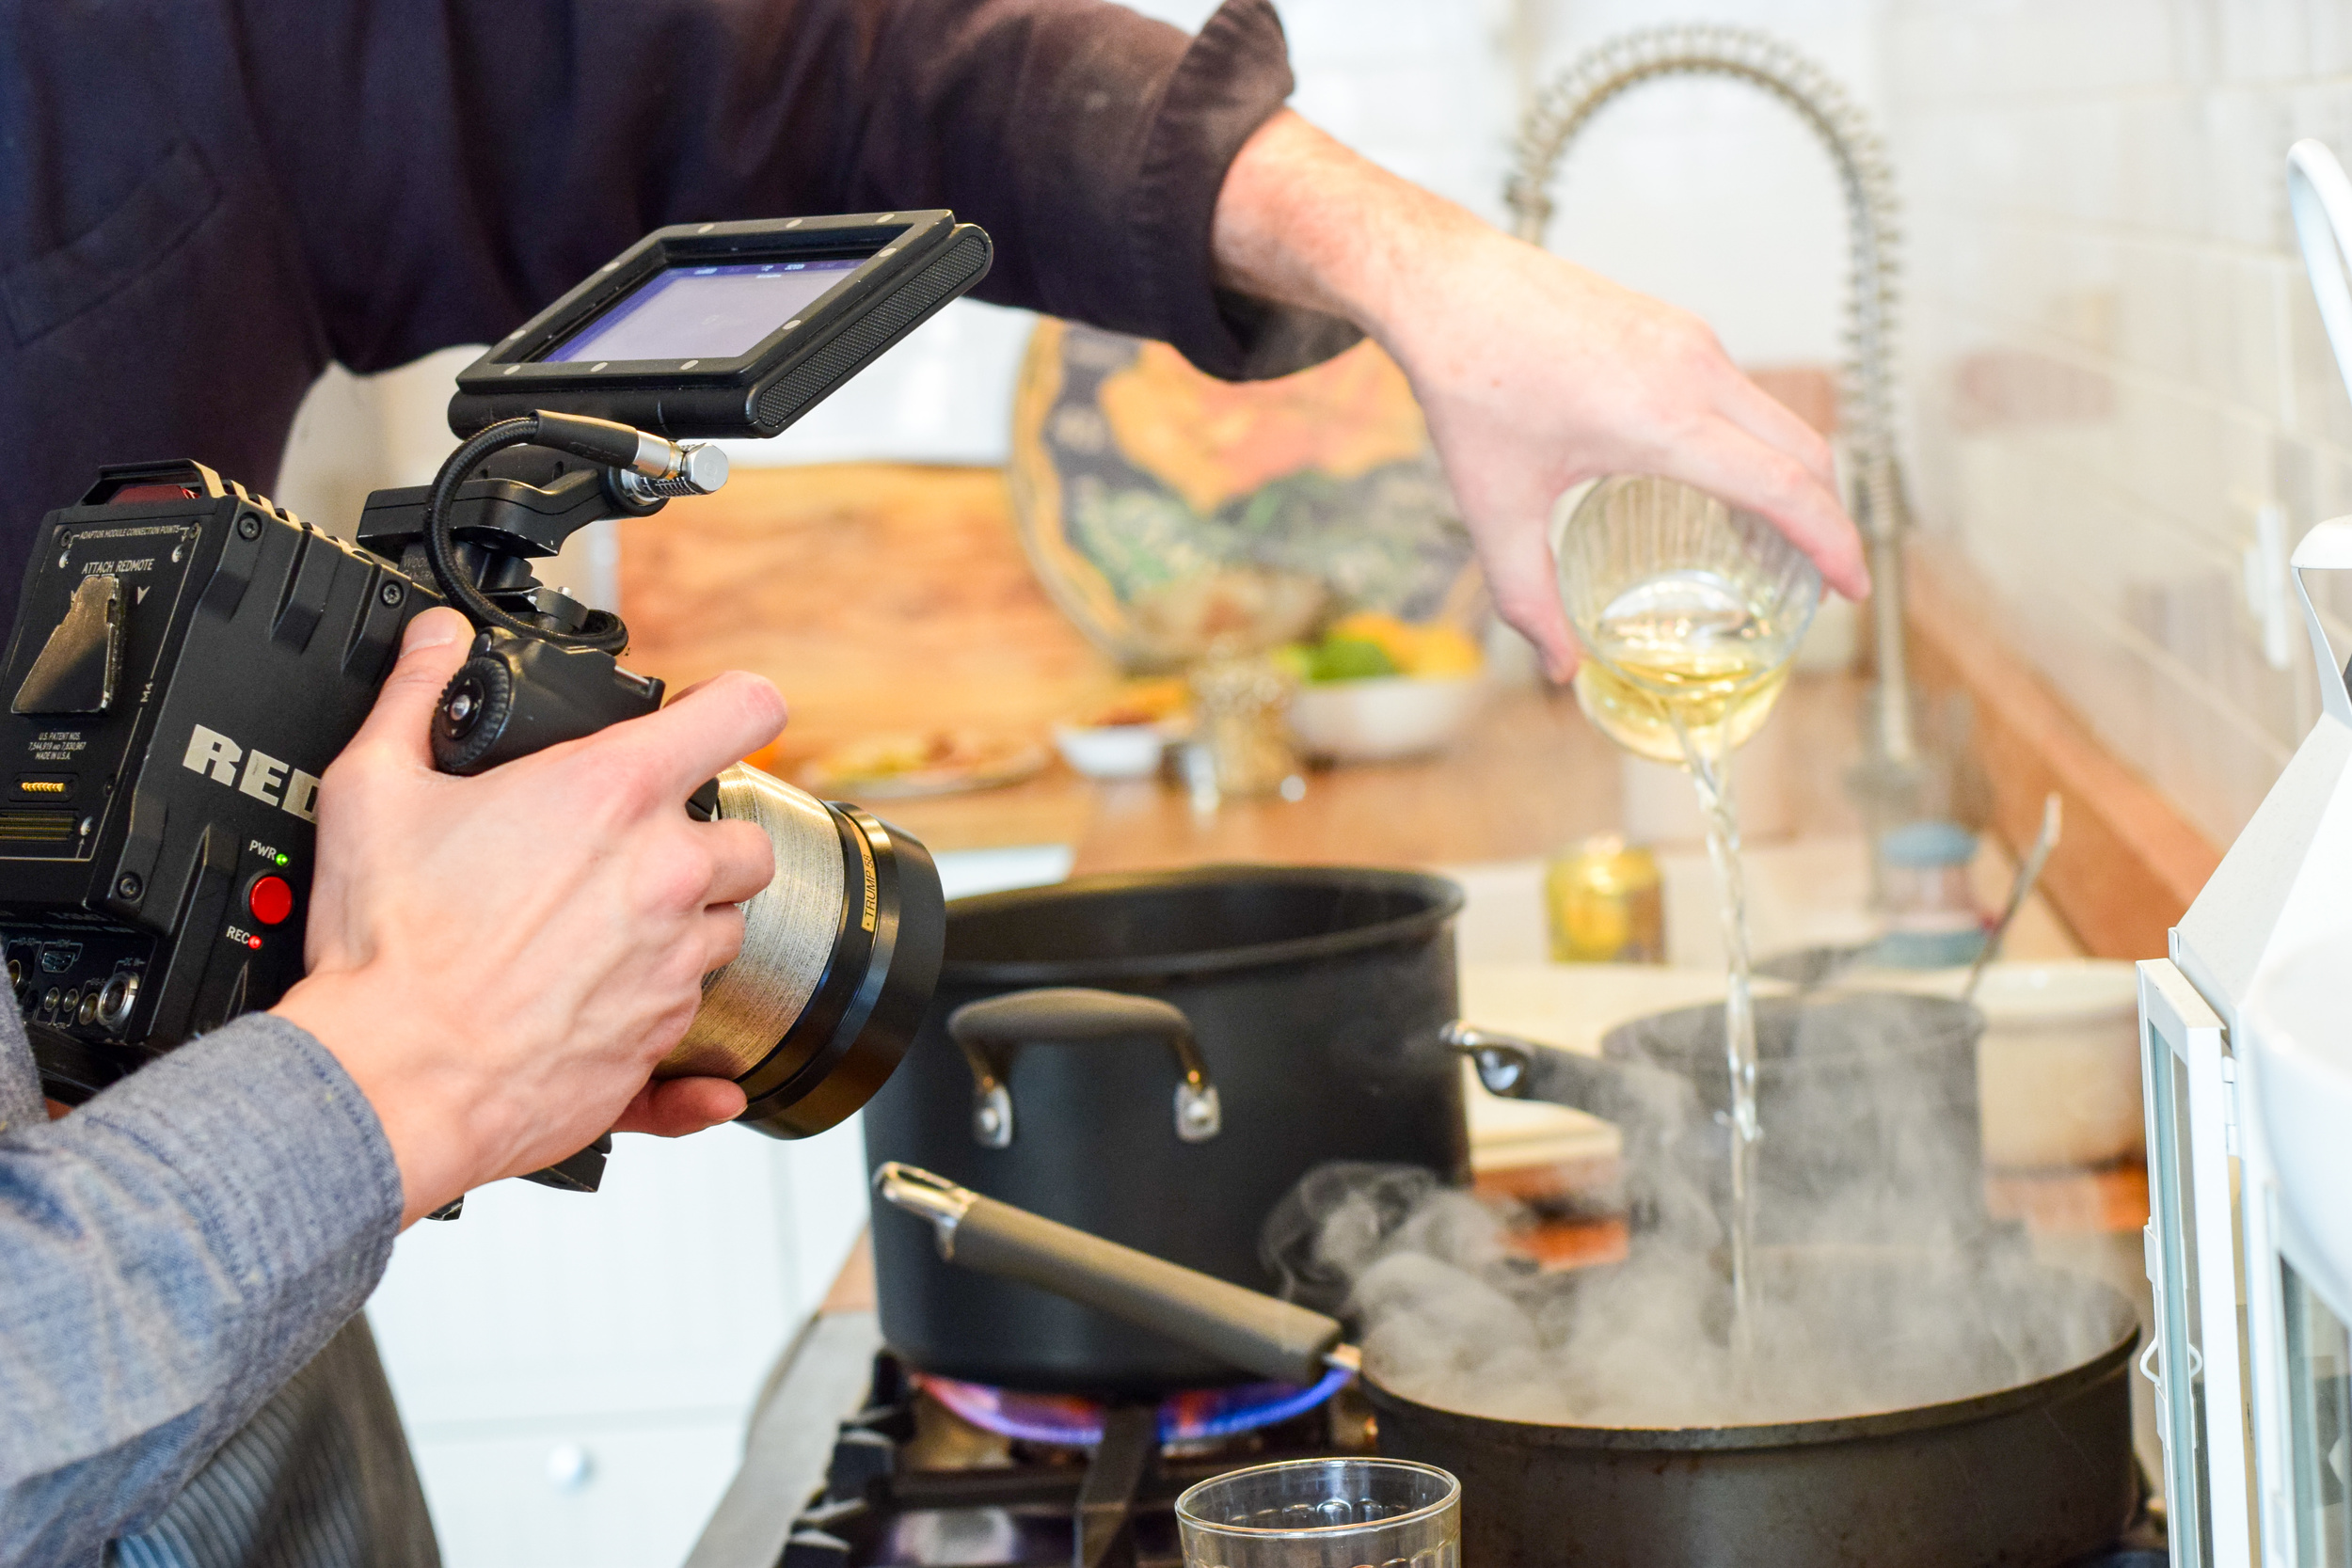 Eric Formato Formatografia photography Maura Gaughan Video Production Entreprenuership Charles Webb Chef Culinary Art -32.jpg